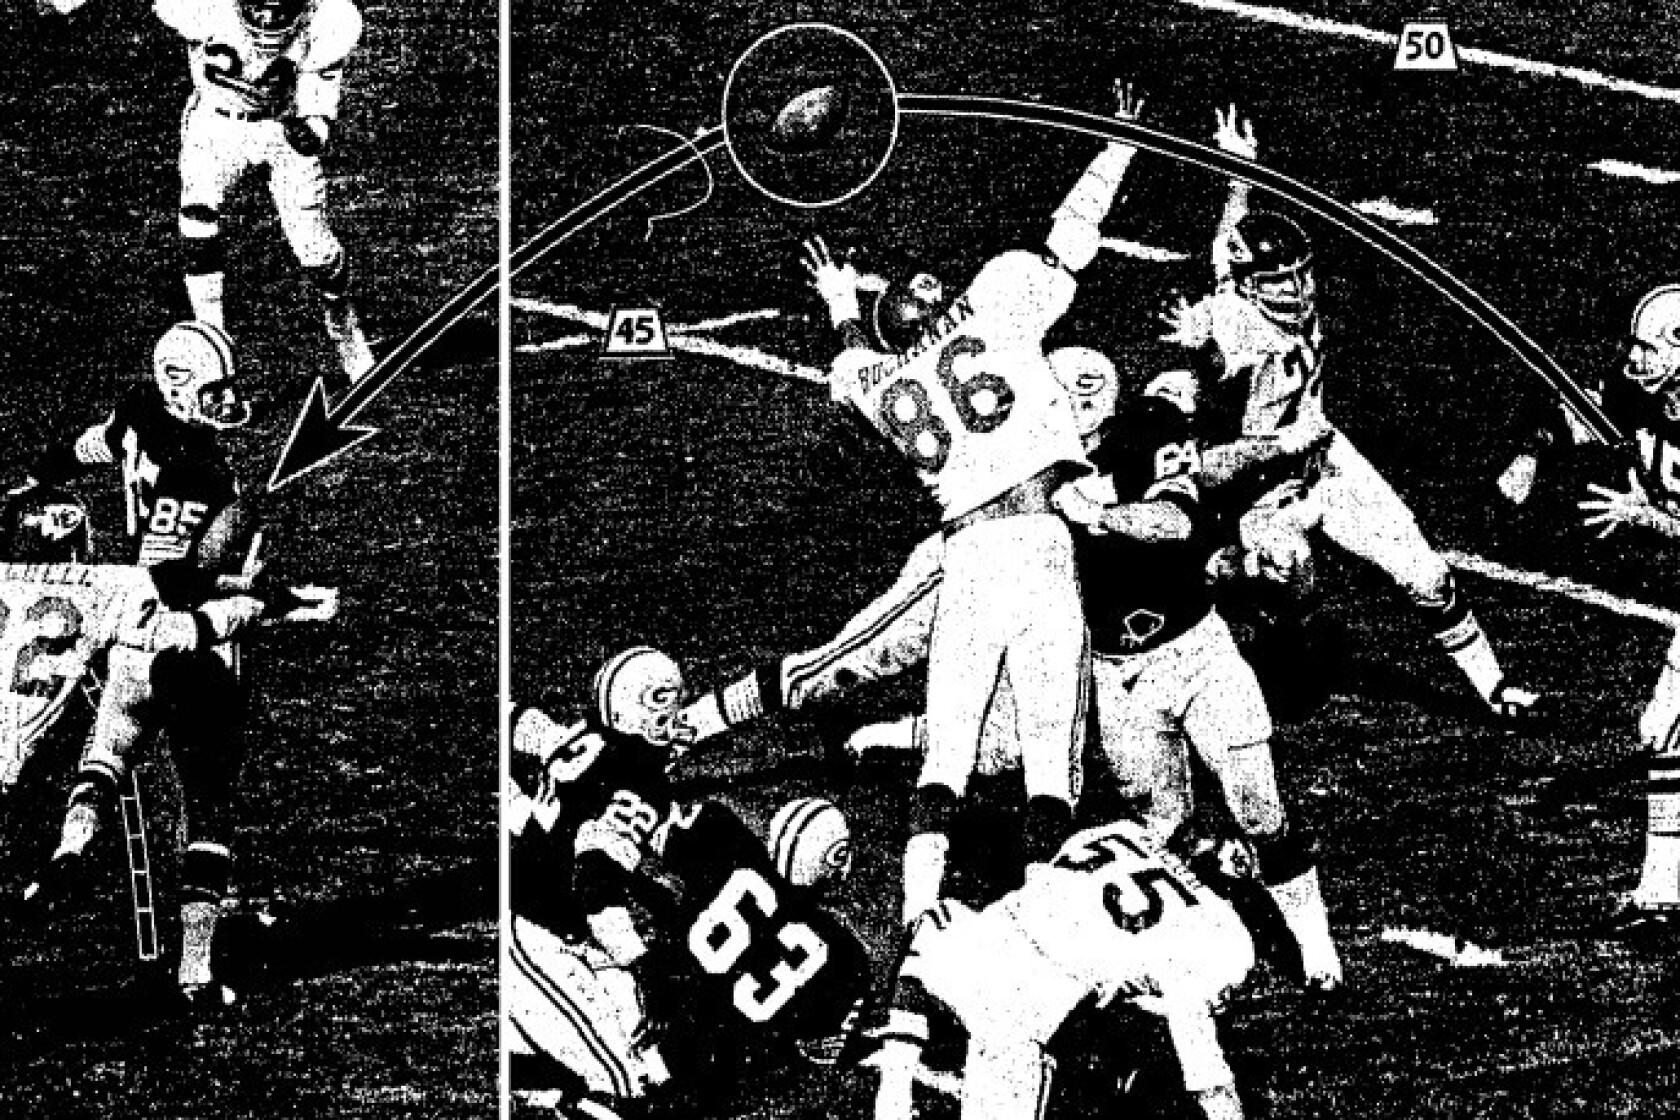 super popular 2a374 6585d The first Super Bowl, in L.A. in 1967, wasn't even called ...